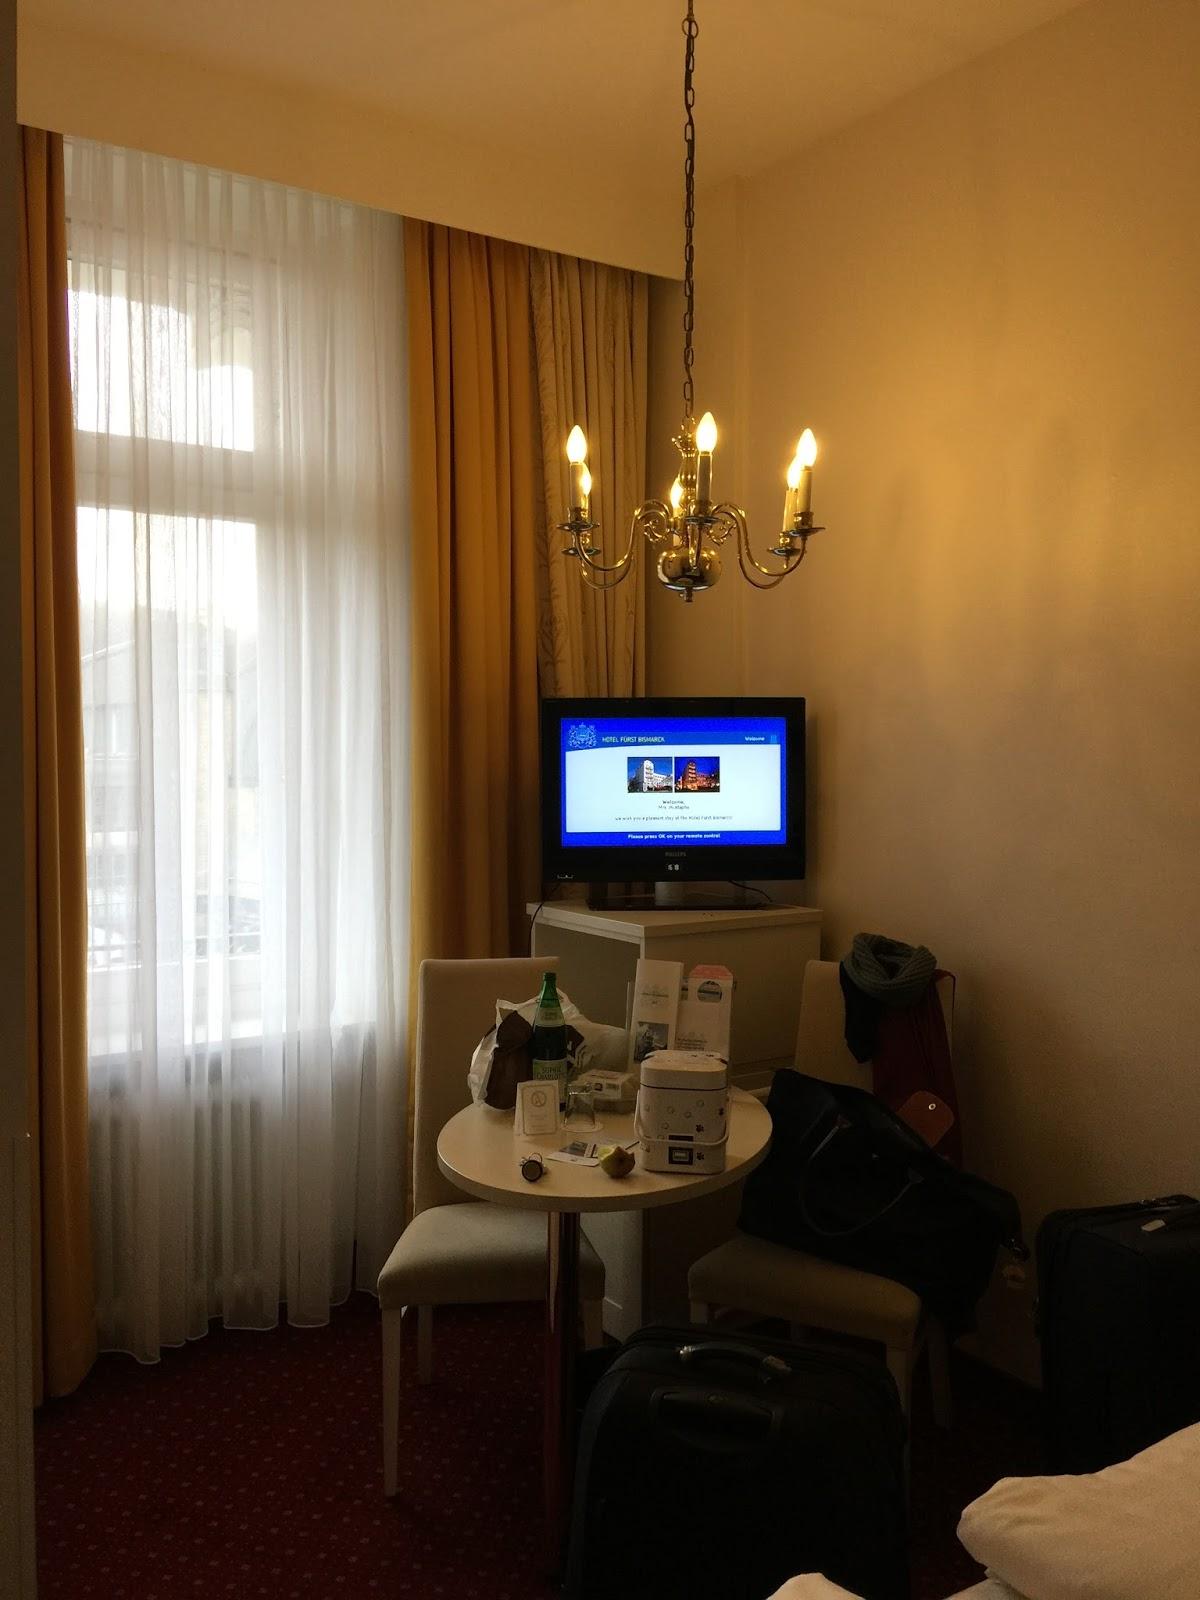 aswana cliche hamburg 1 night stay in hotel fuerst bismarck. Black Bedroom Furniture Sets. Home Design Ideas